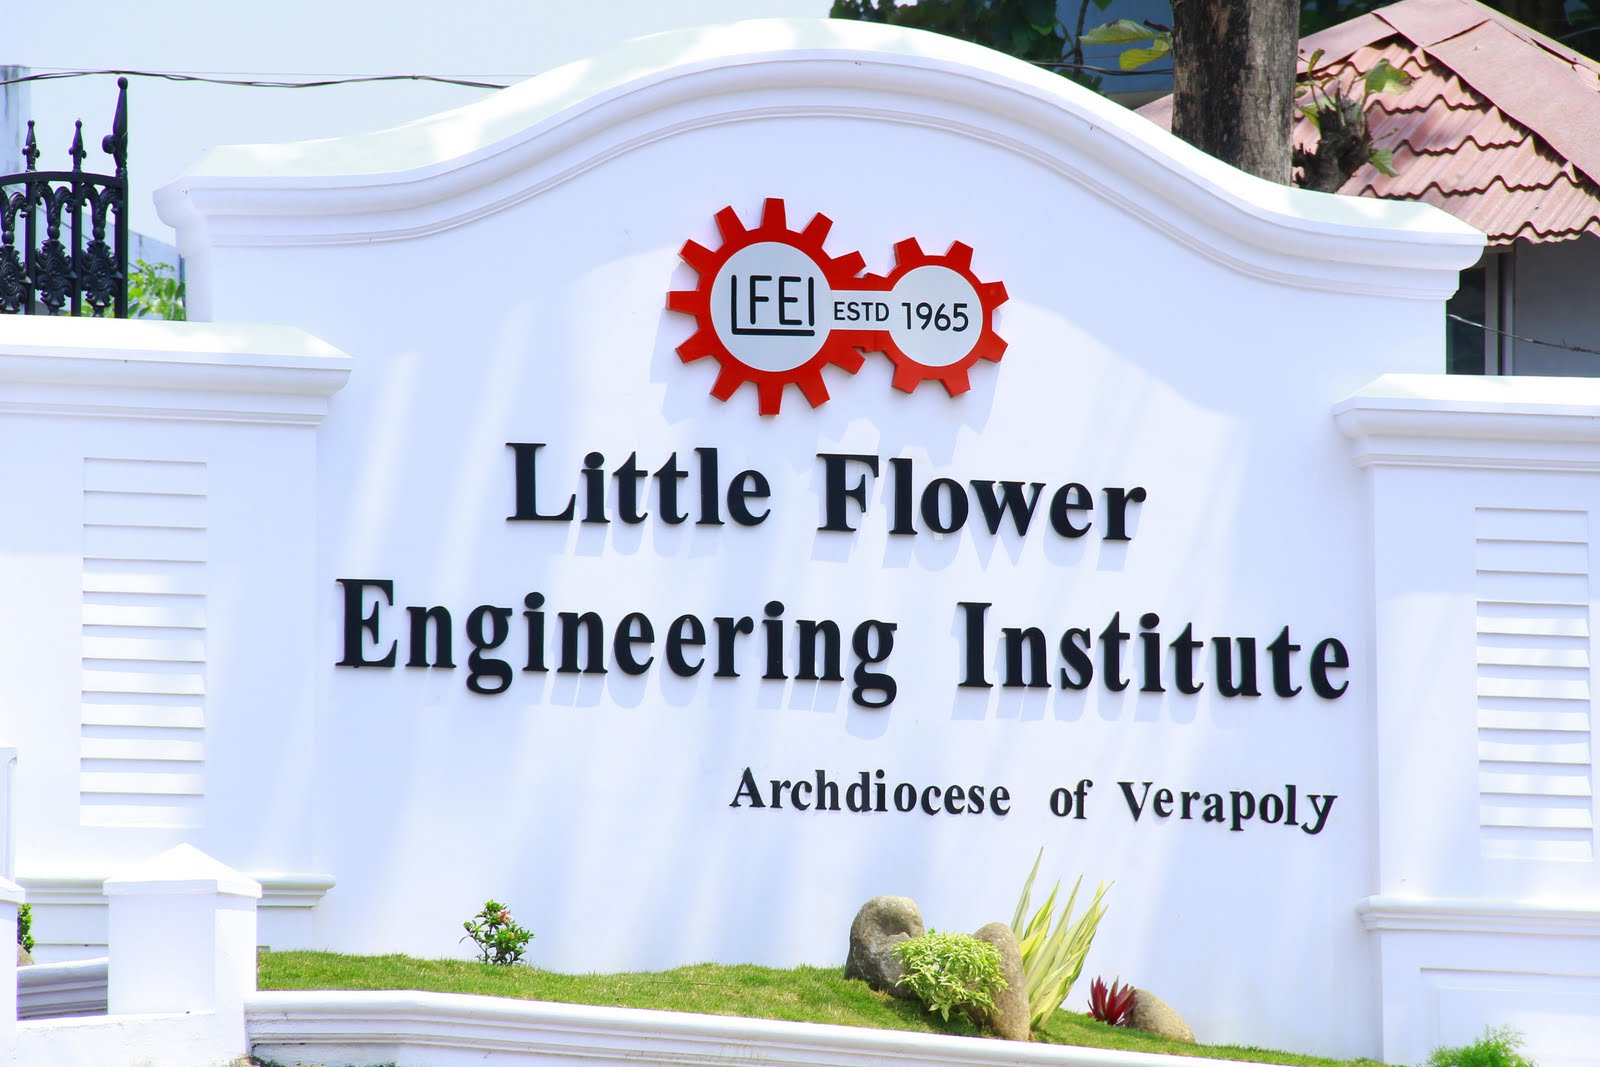 Little Flower Engineering Institute LFEI